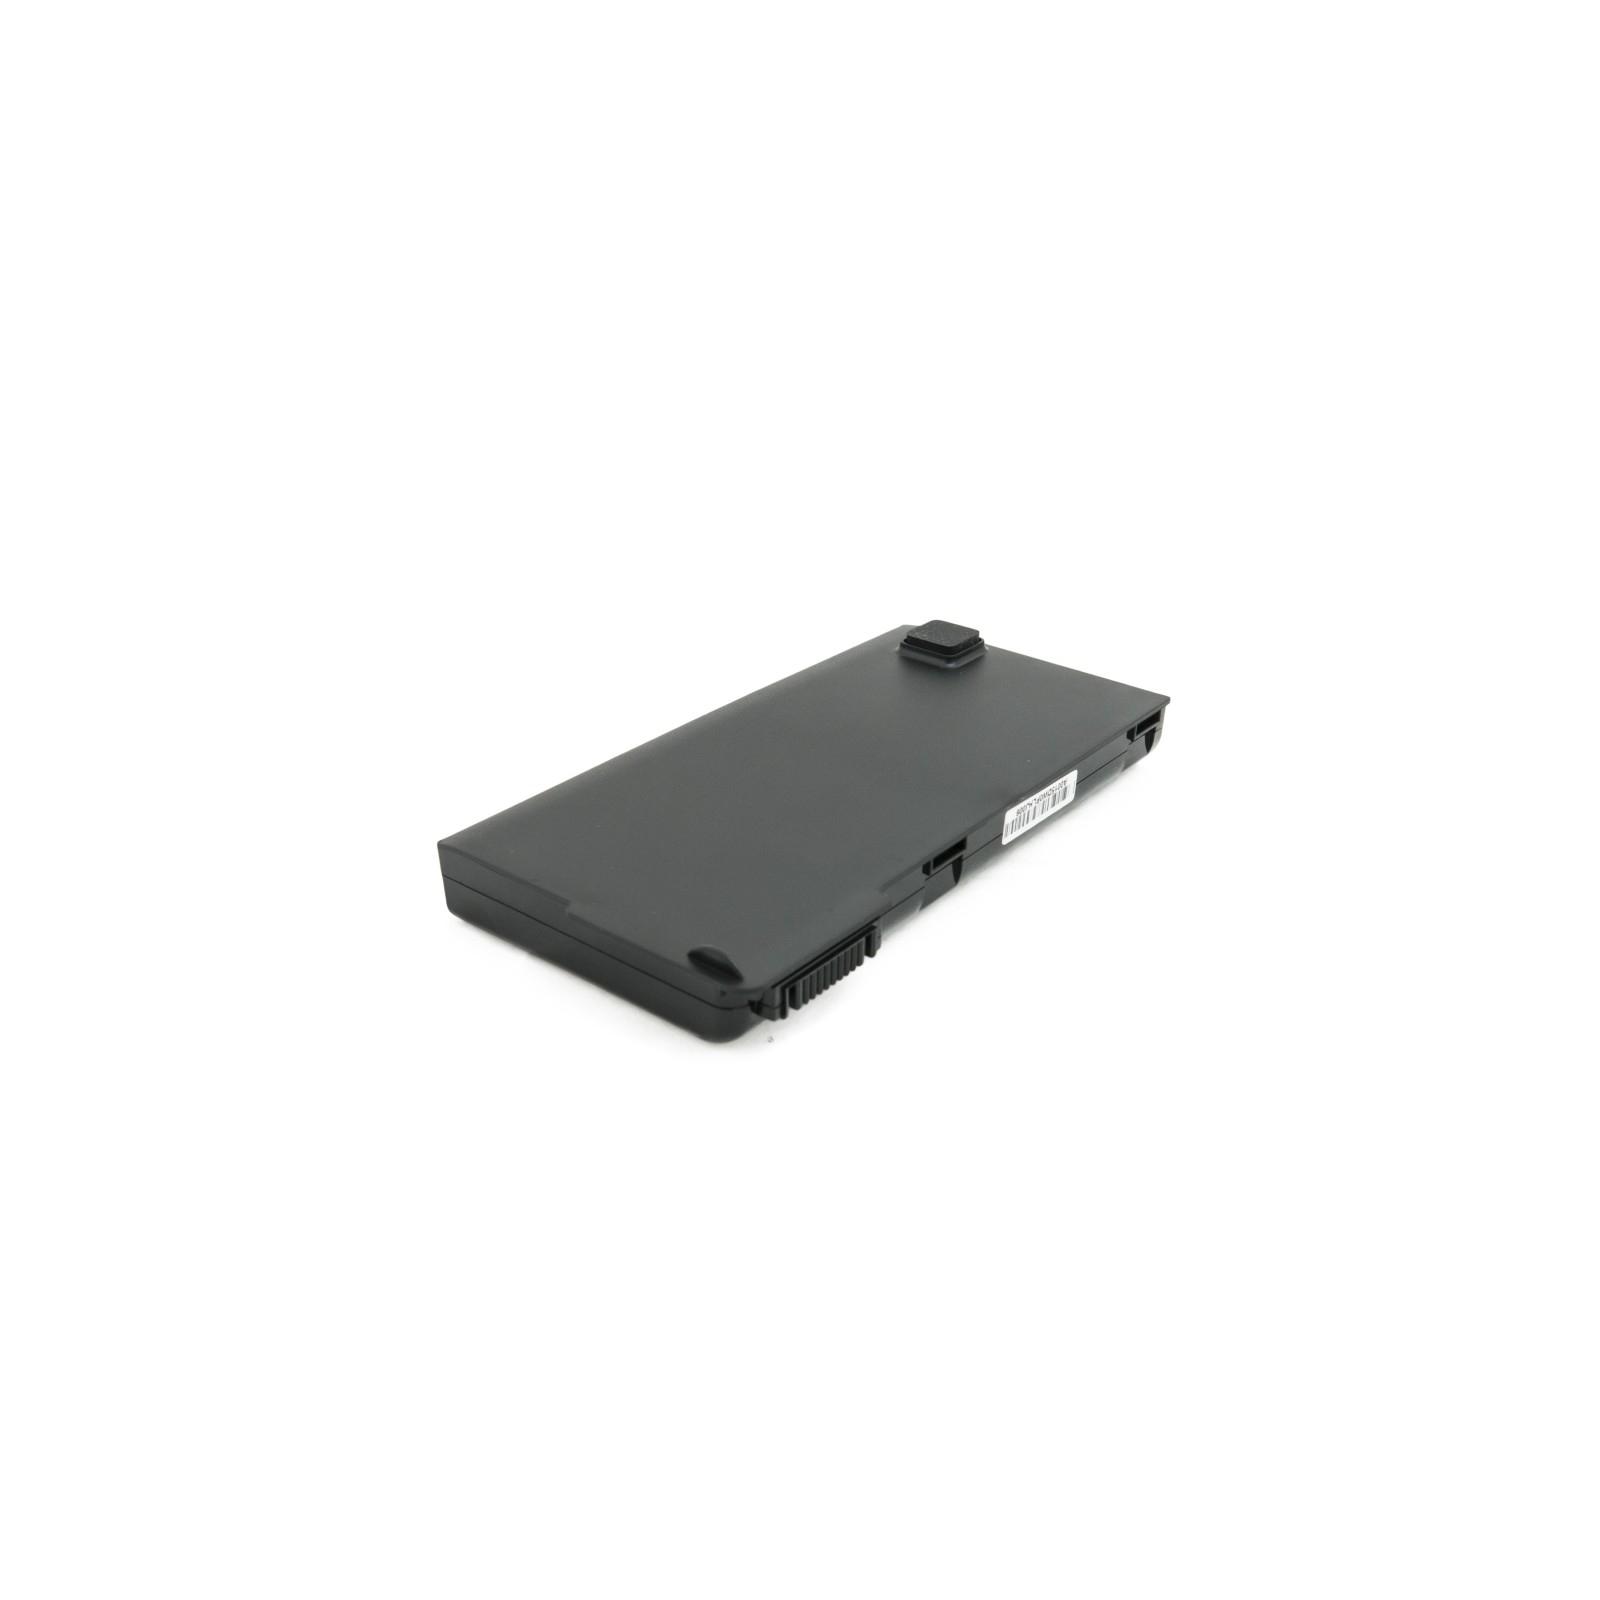 Аккумулятор для ноутбука MSI CX620 (BTY-L75) 5200 mAh EXTRADIGITAL (BNM3956) изображение 3